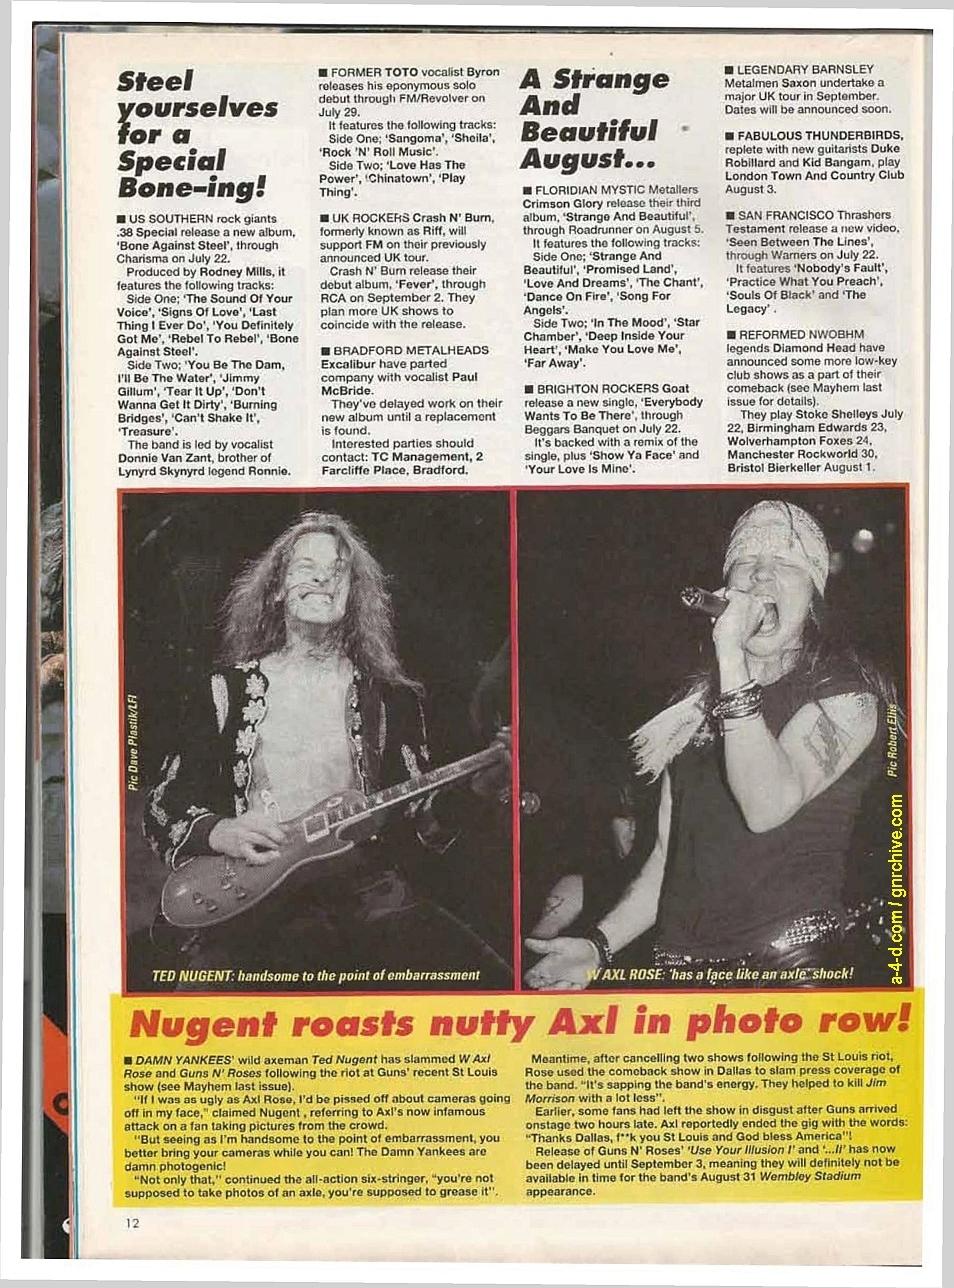 1991.07.20 - Kerrang - Singlez/GN'R latest news update: no 'Illusion' 'til September? 1991-019